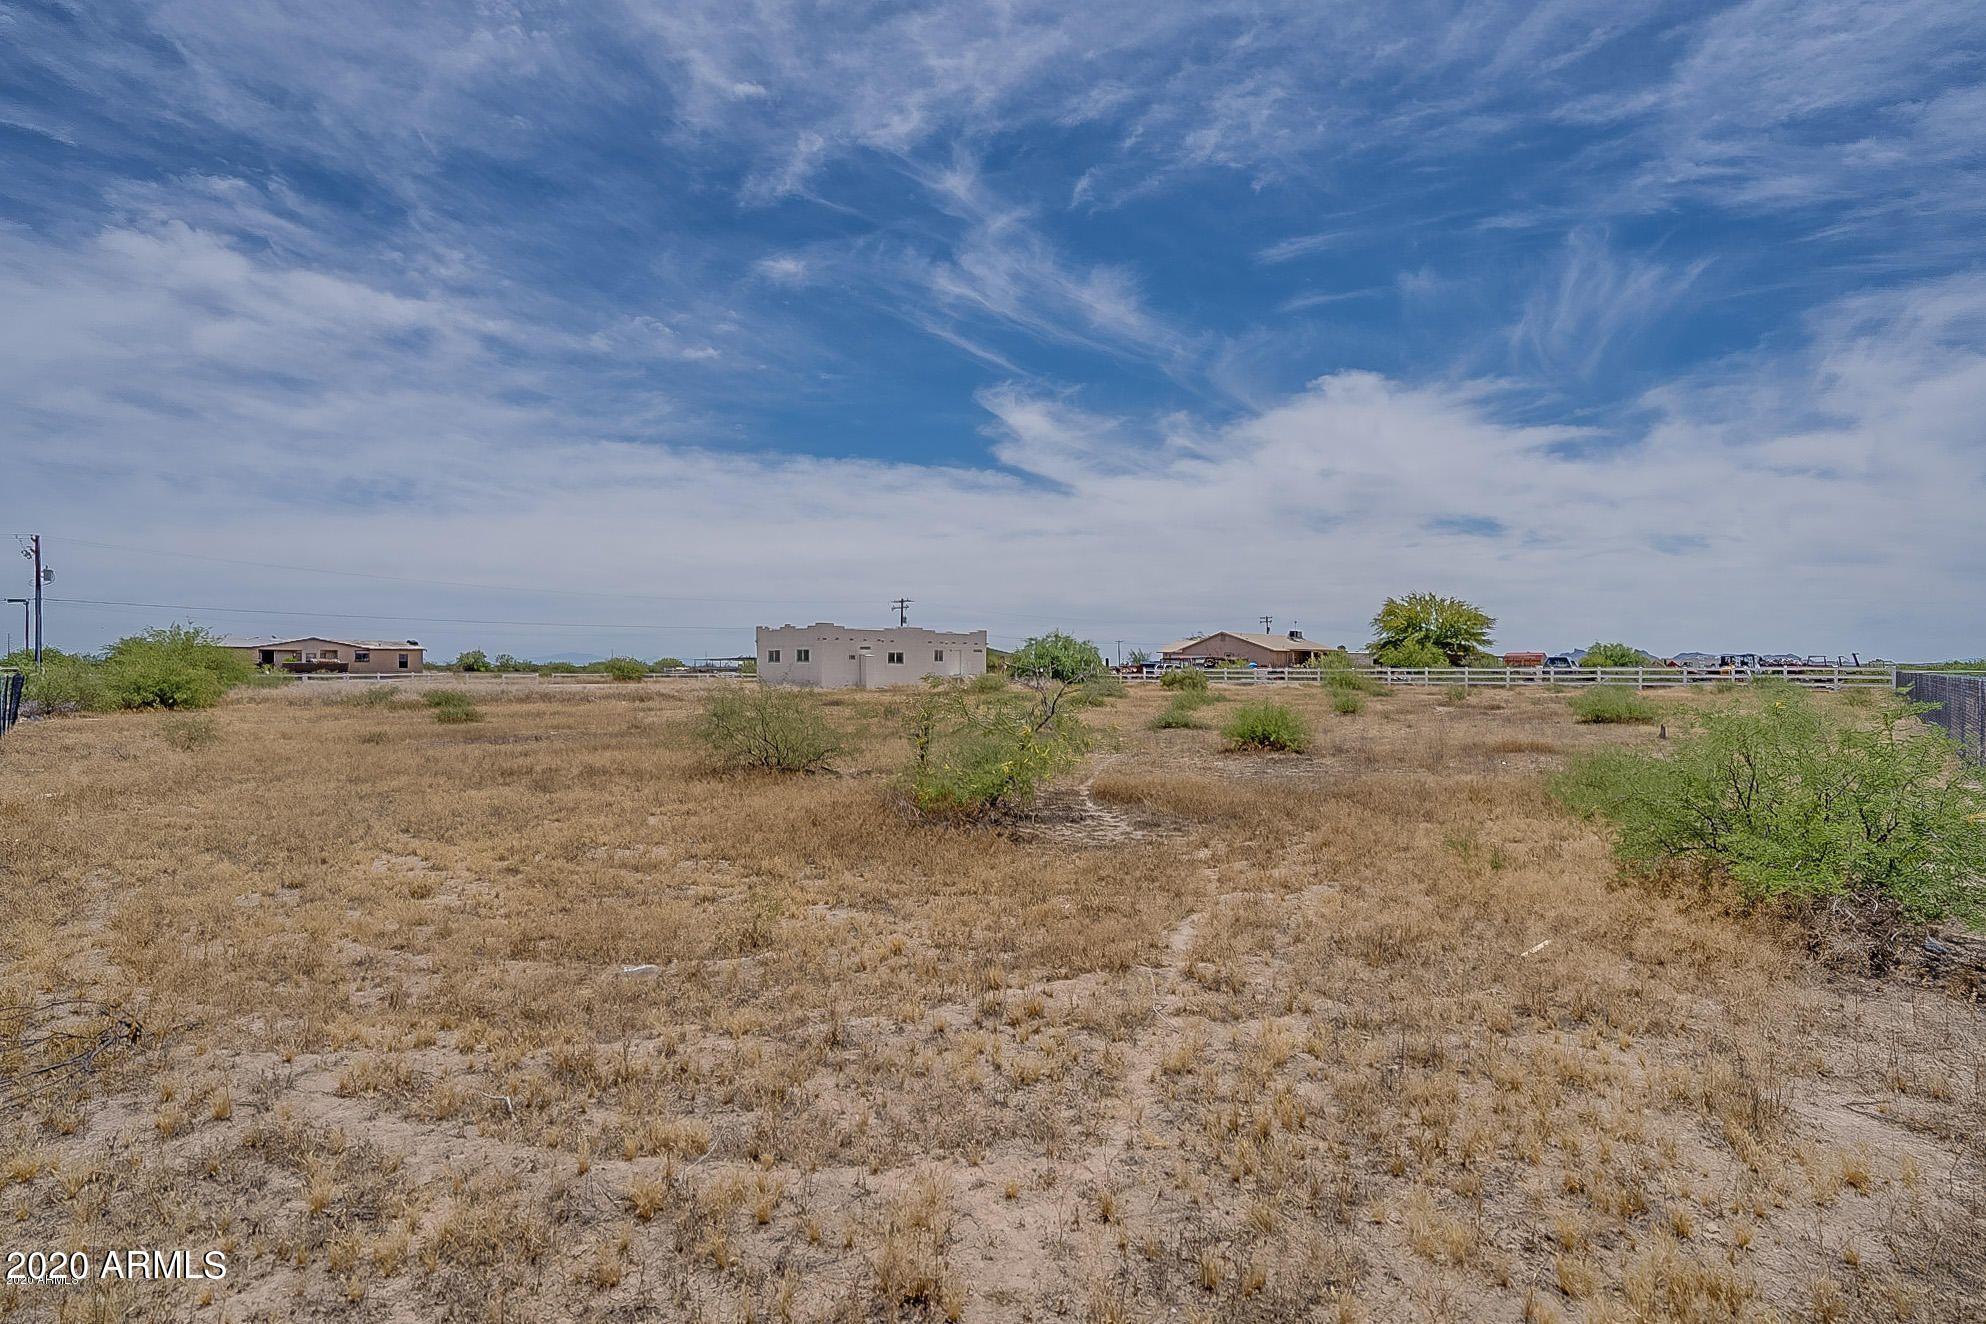 12302 S RACHEL Lane, Casa Grande, Arizona 85193, ,Lots And Land,For Sale,12302 S RACHEL Lane,6174938